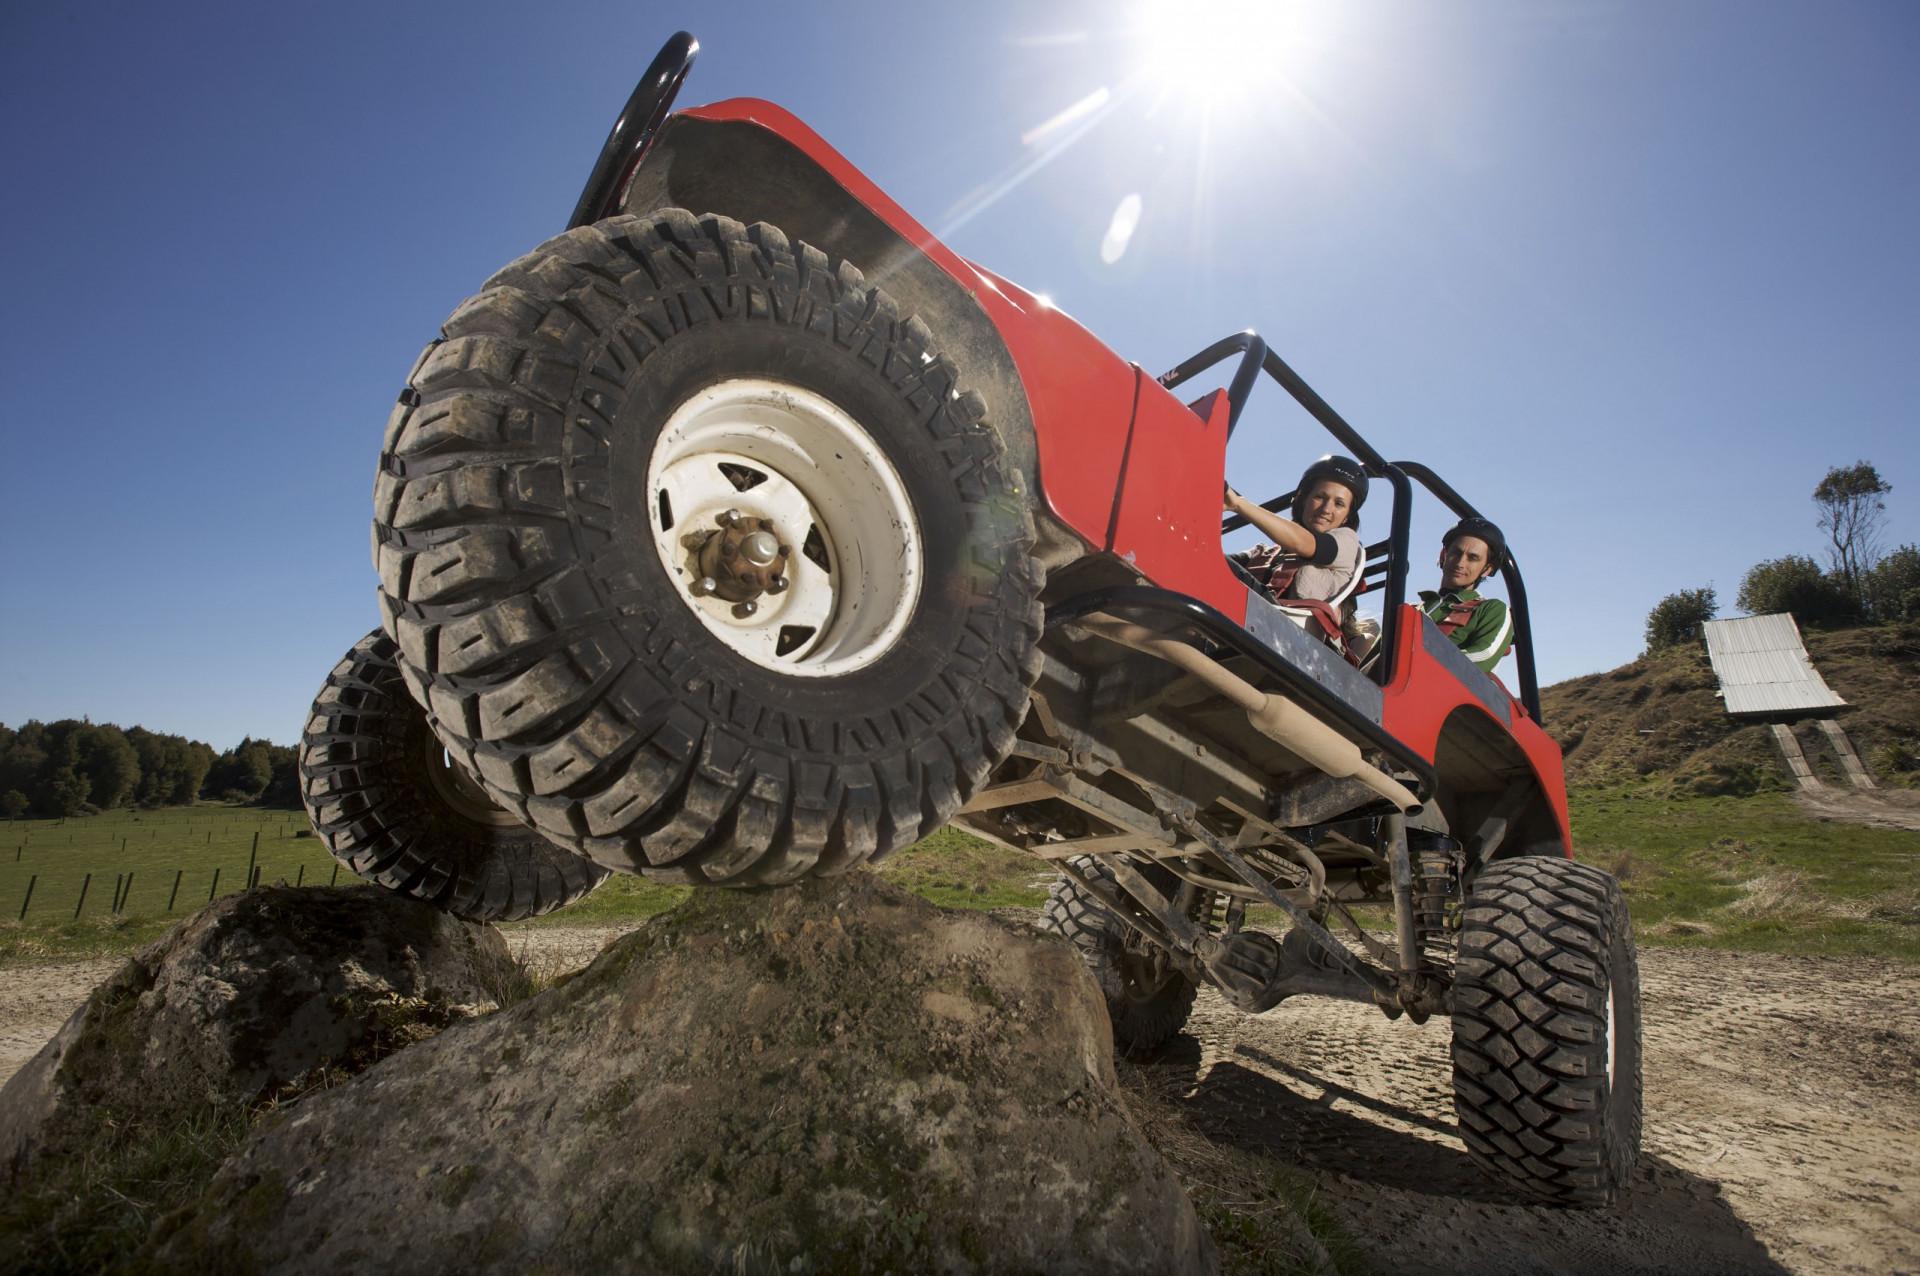 Monster 4x4 Thrill Ride Kids